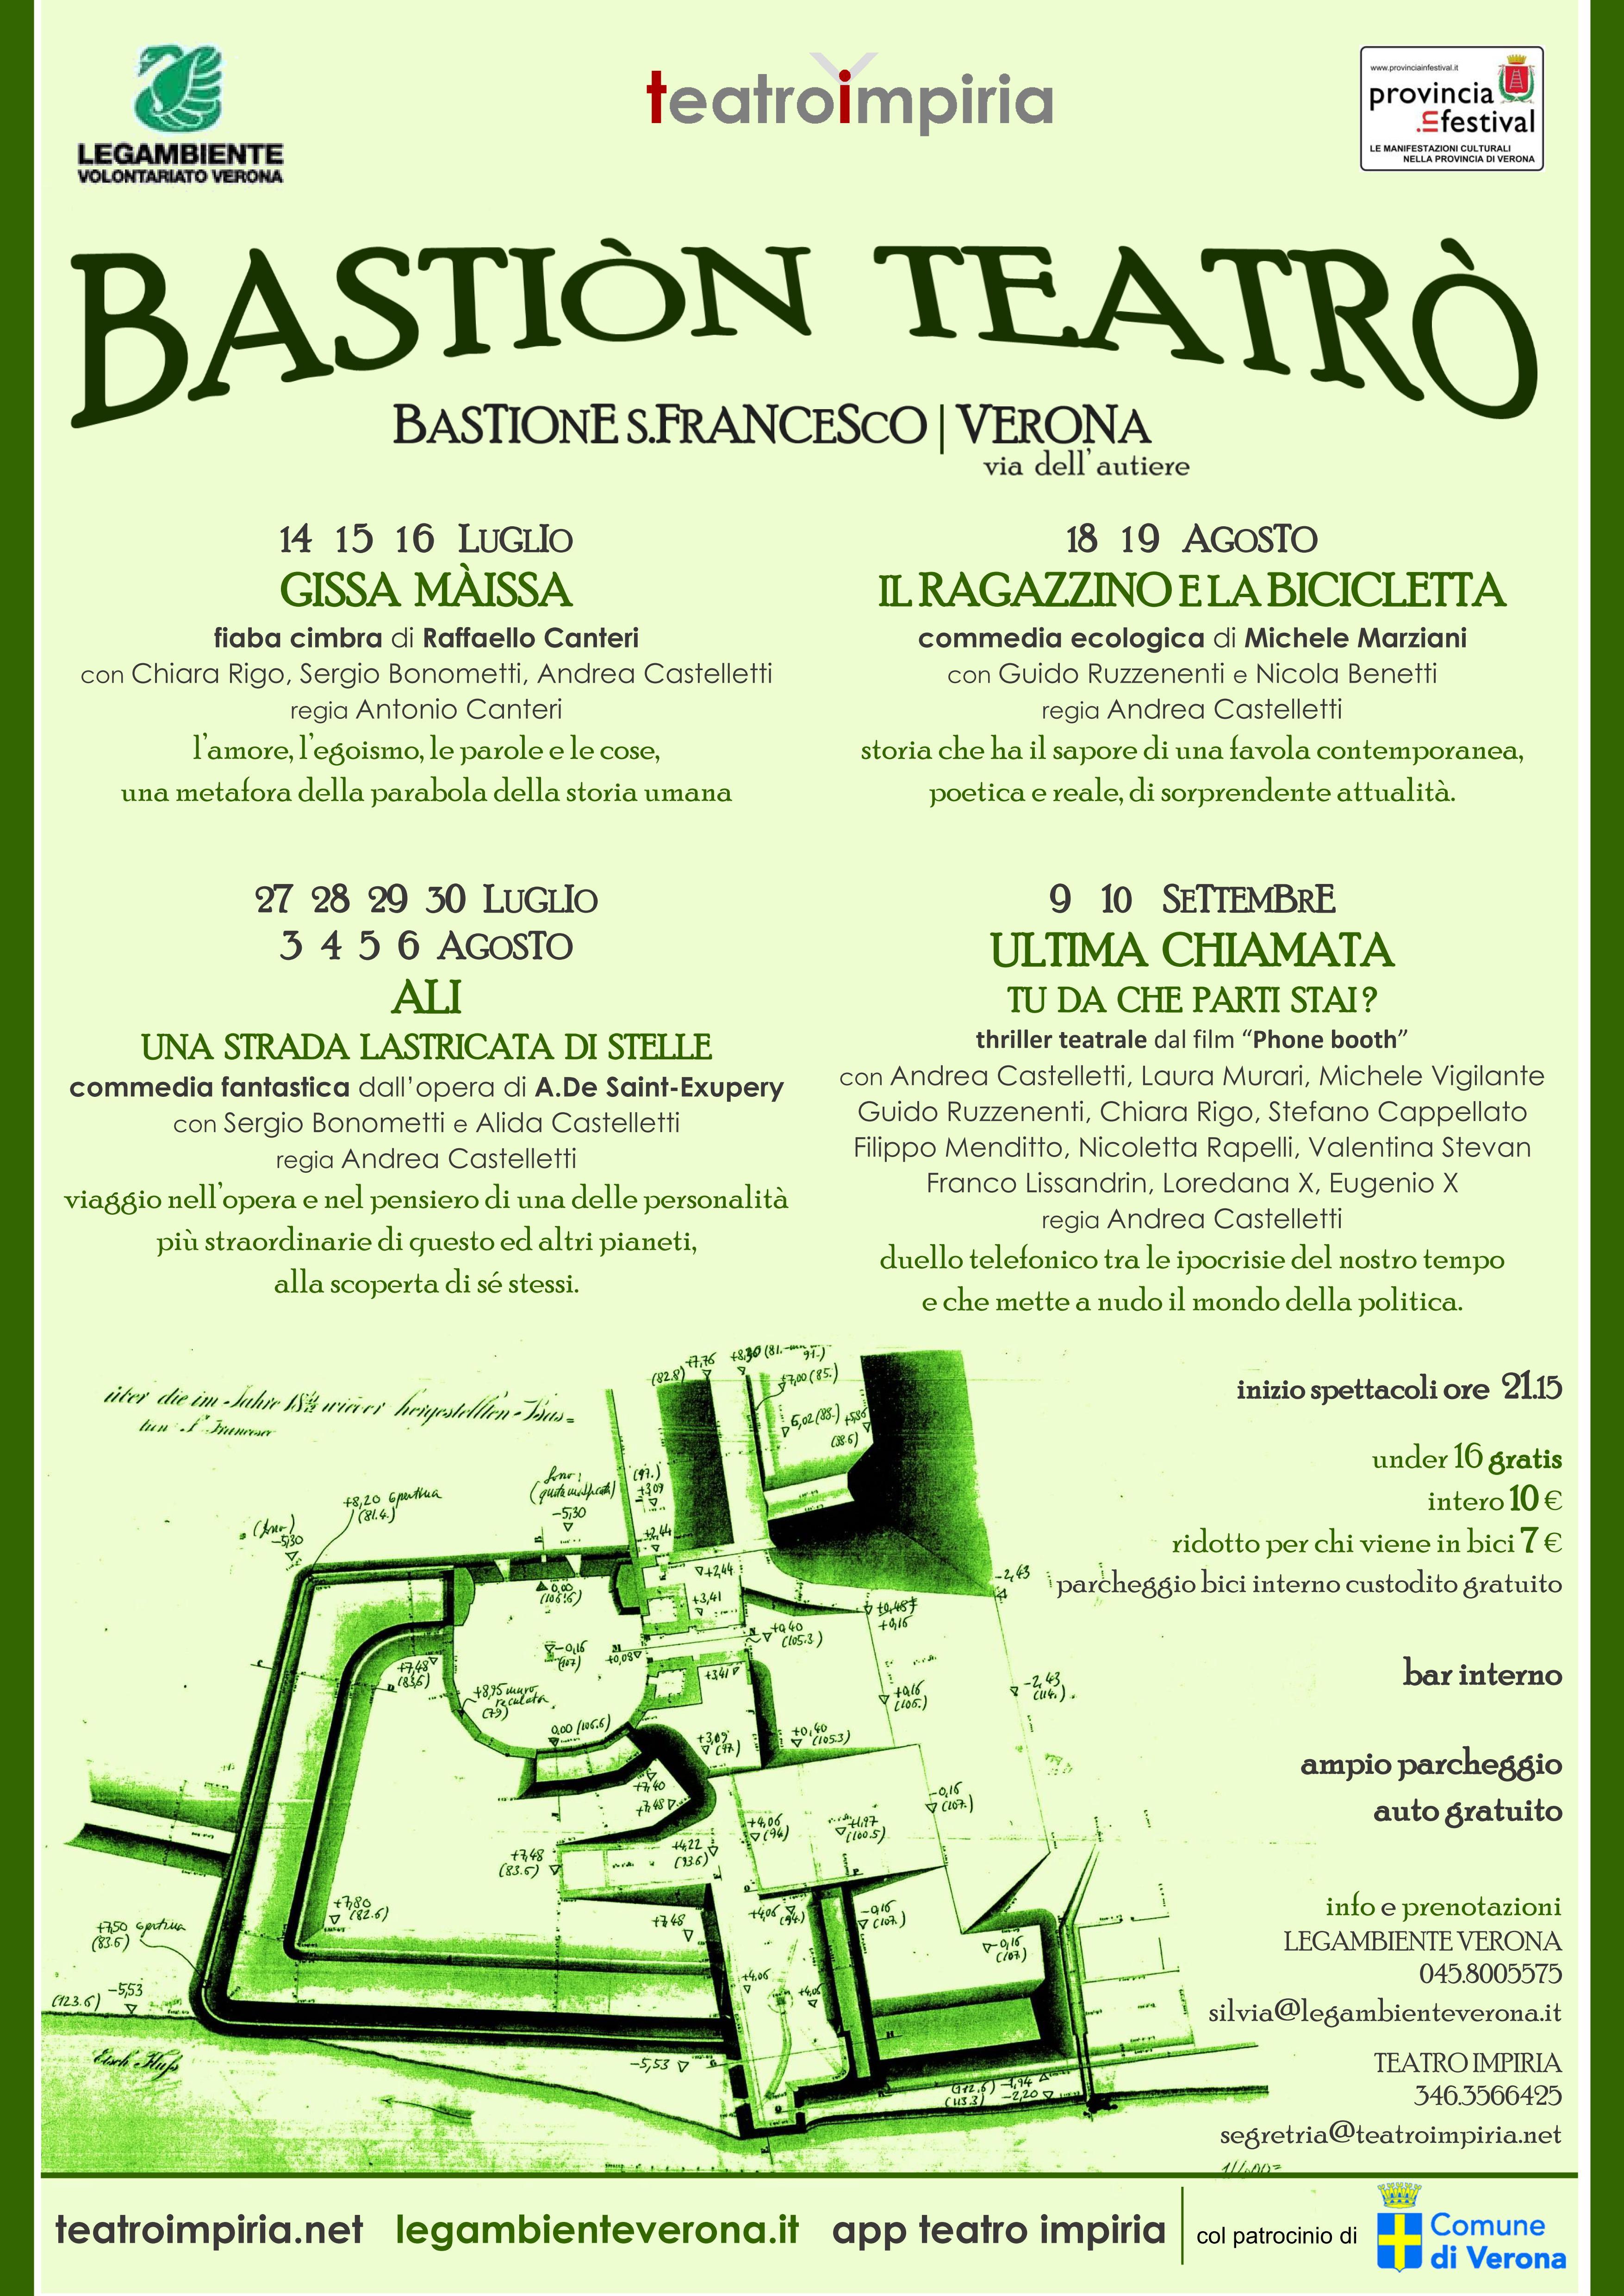 teatro-impiria-verona-bastion-teatro-legambiente-bastione-san-francesco